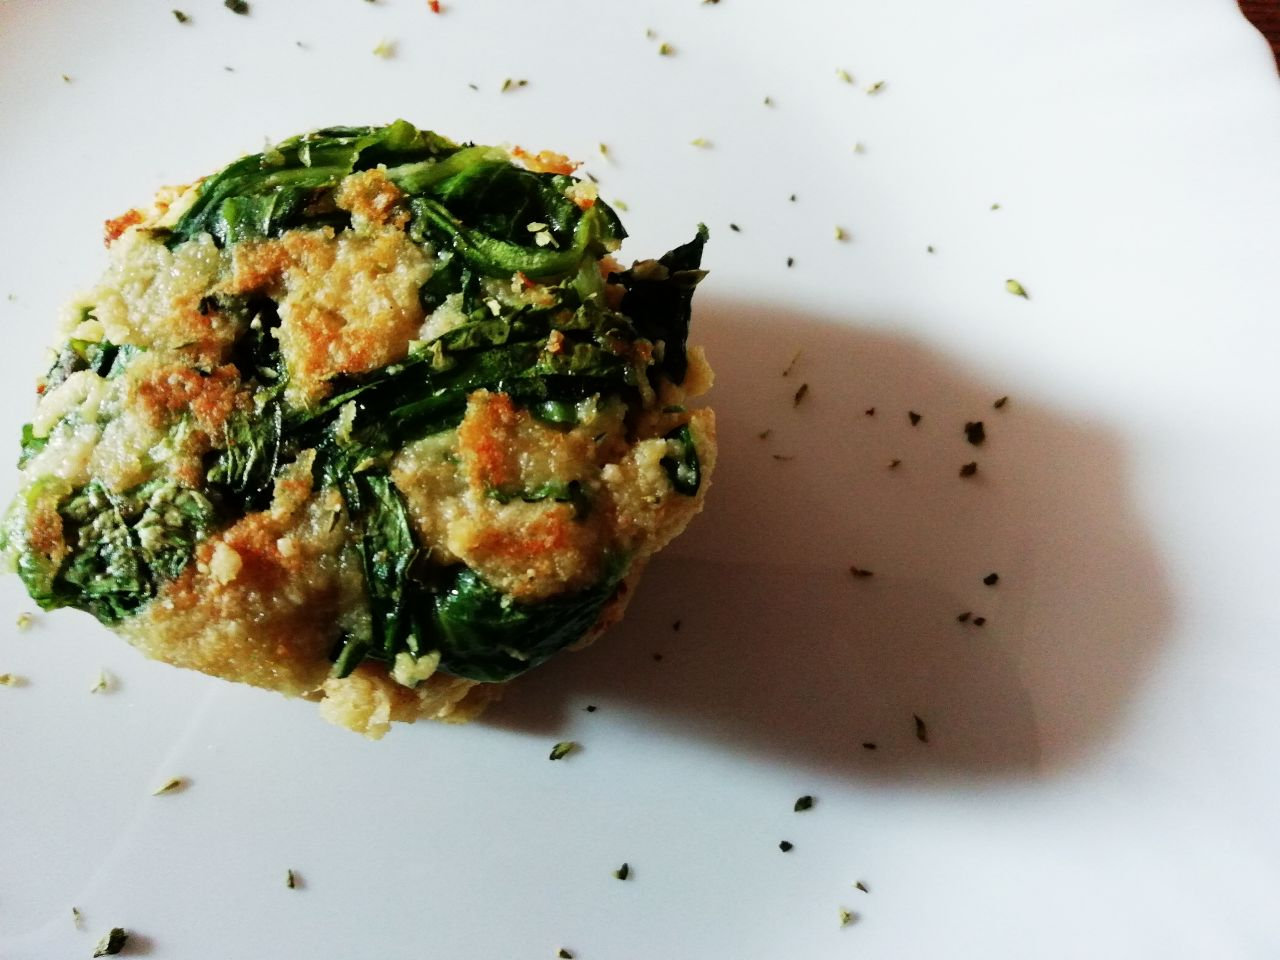 Ricette vegetariane: schiacciatine di verdura in padella, senza formaggio!